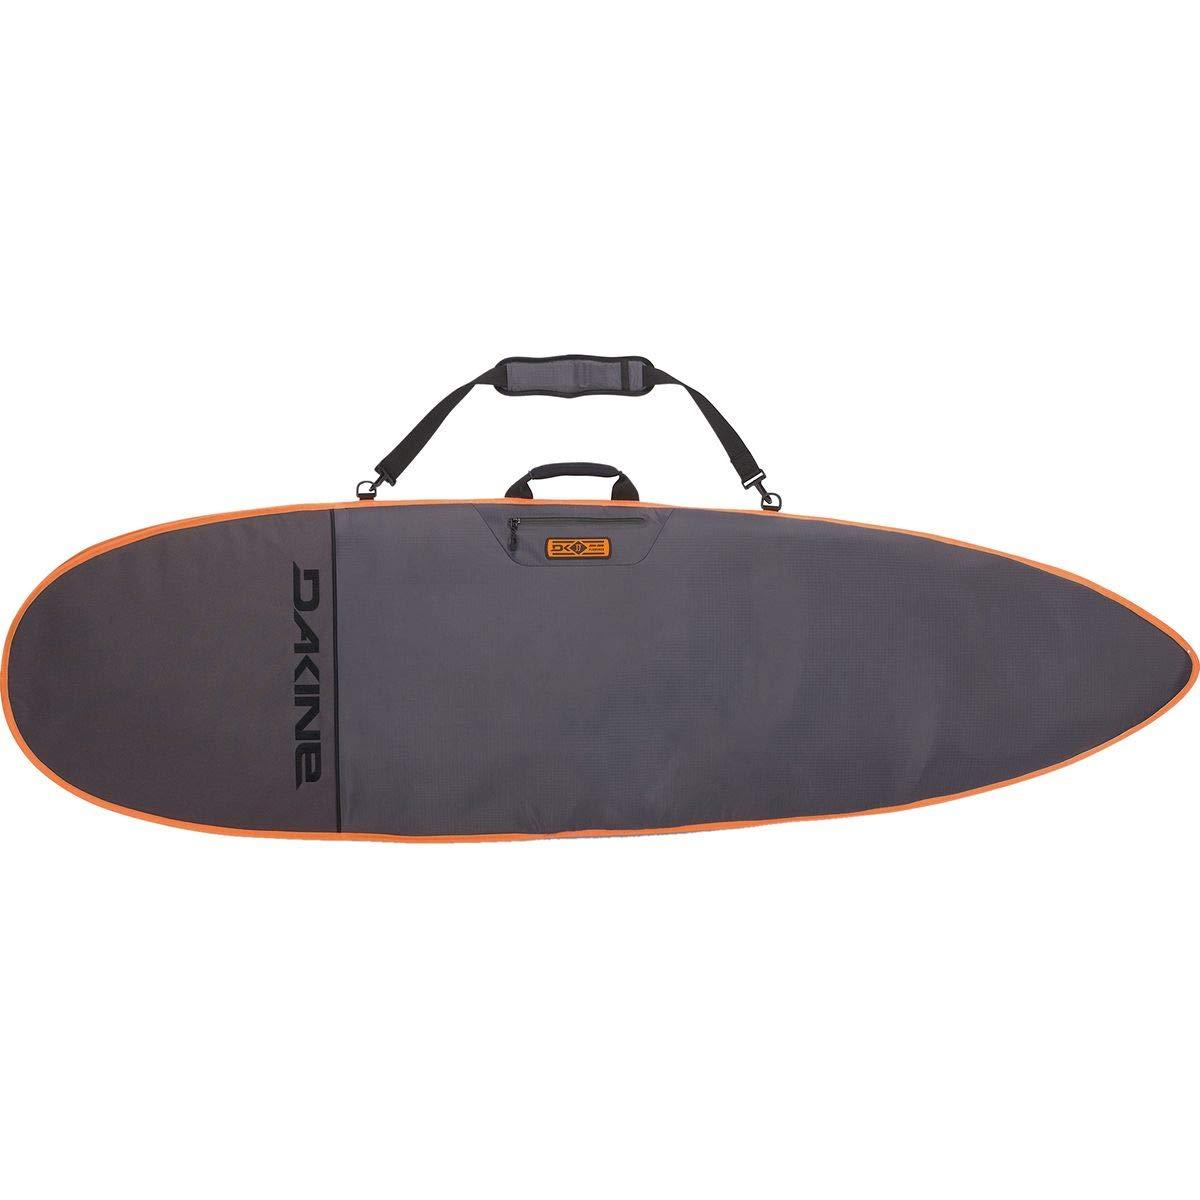 6ft 3in x 23in Carbon Bolsa para Tabla de Surf DAKINE John John Florence Daylight